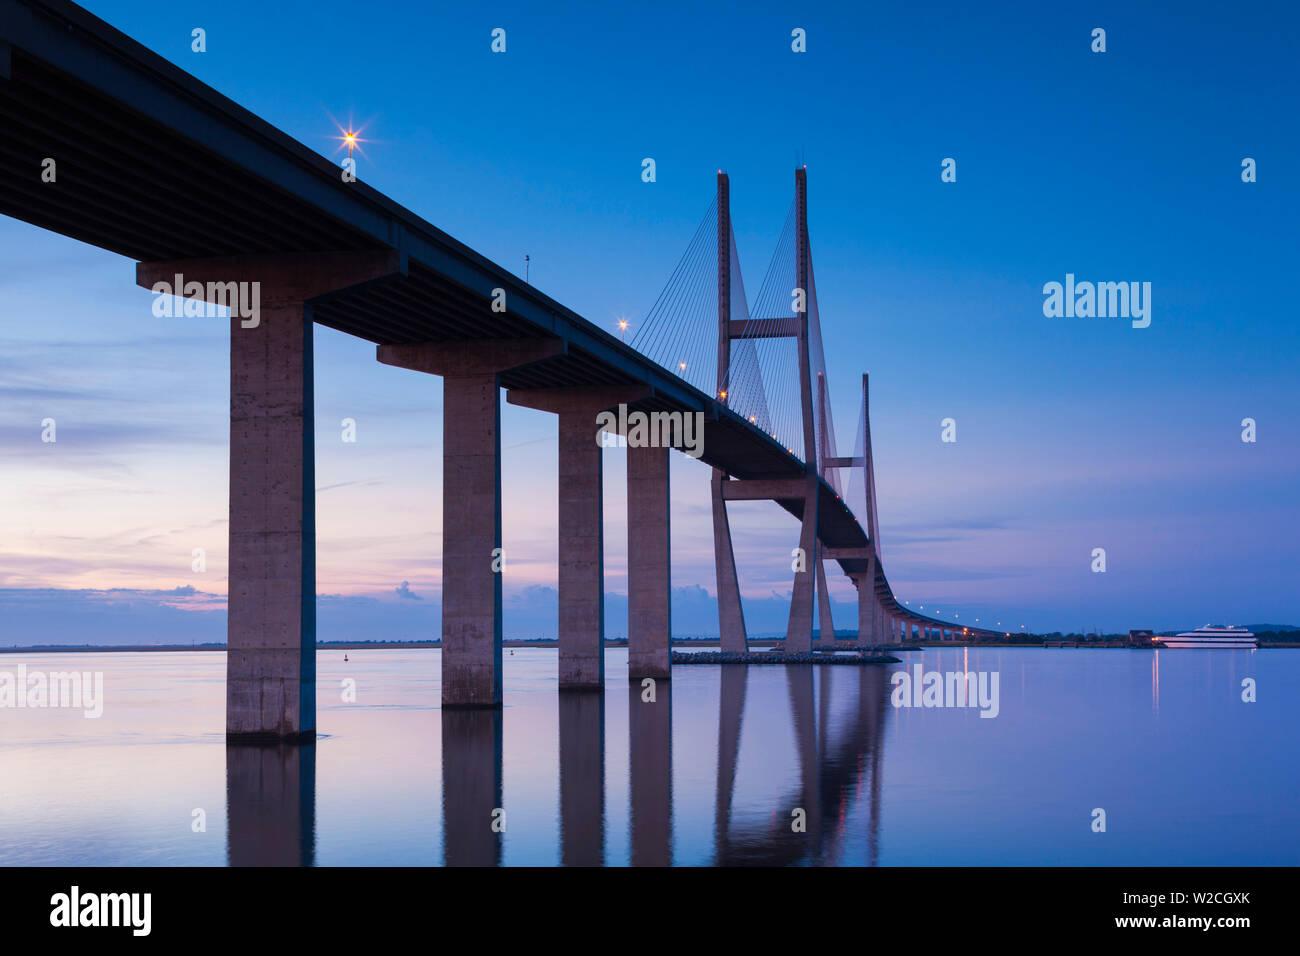 USA, Georgia, Brunswick, Sidney Lanier Bridge, across the Brunswick River - Stock Image